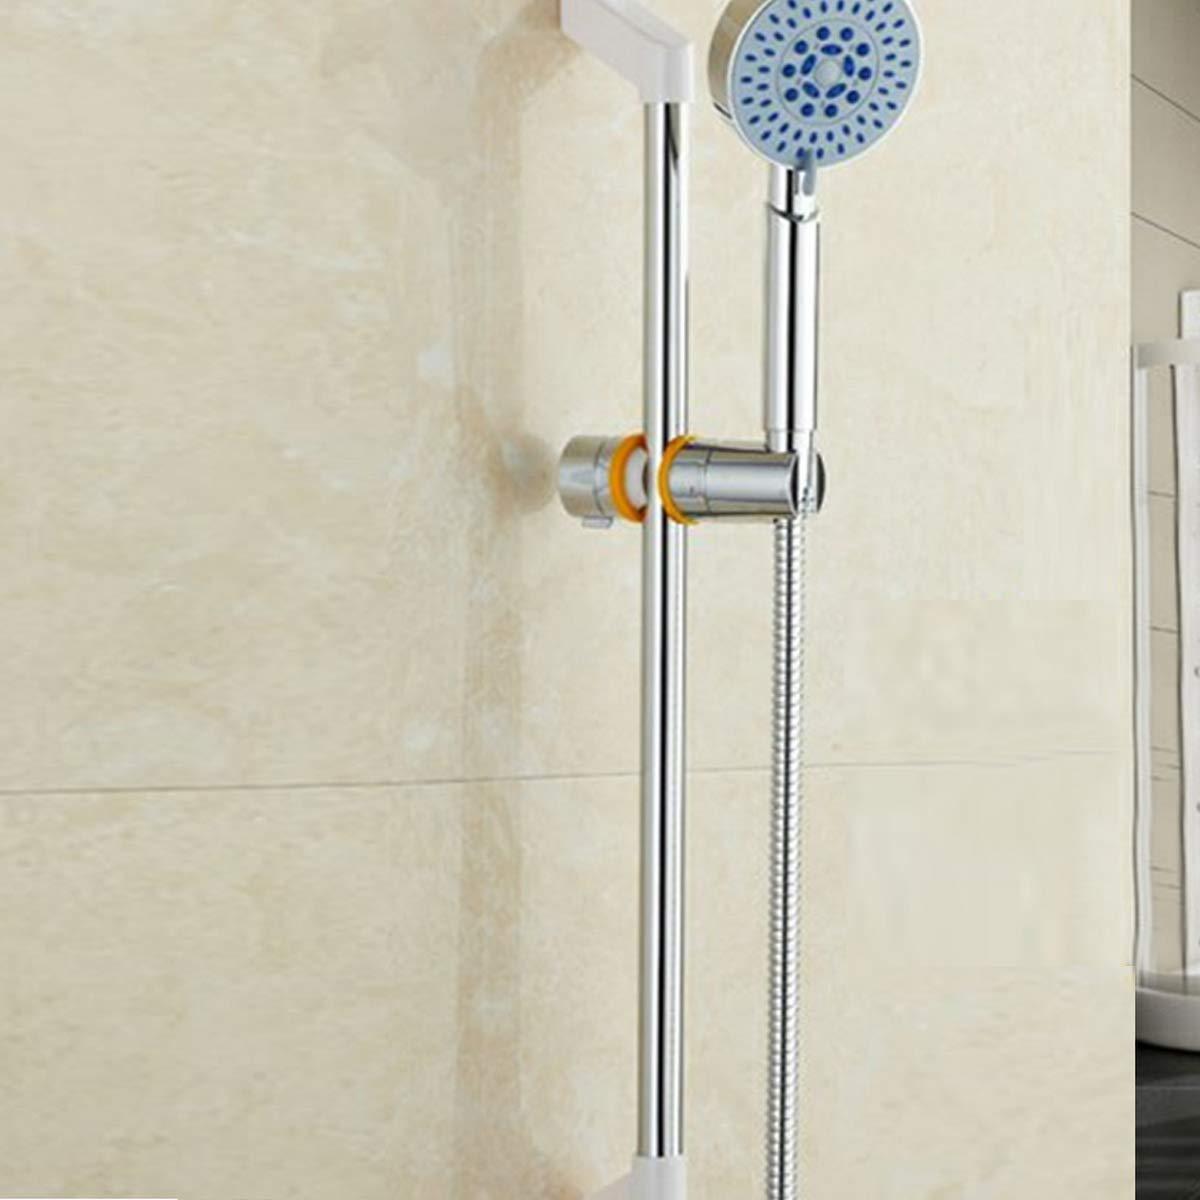 Godagoda Sprinkler Hose 201 Stainless Steel Hose Shower Hose Sanitary Hose Water Inlet Explosion-Proof Spring Shower Hose by Godagoda (Image #4)